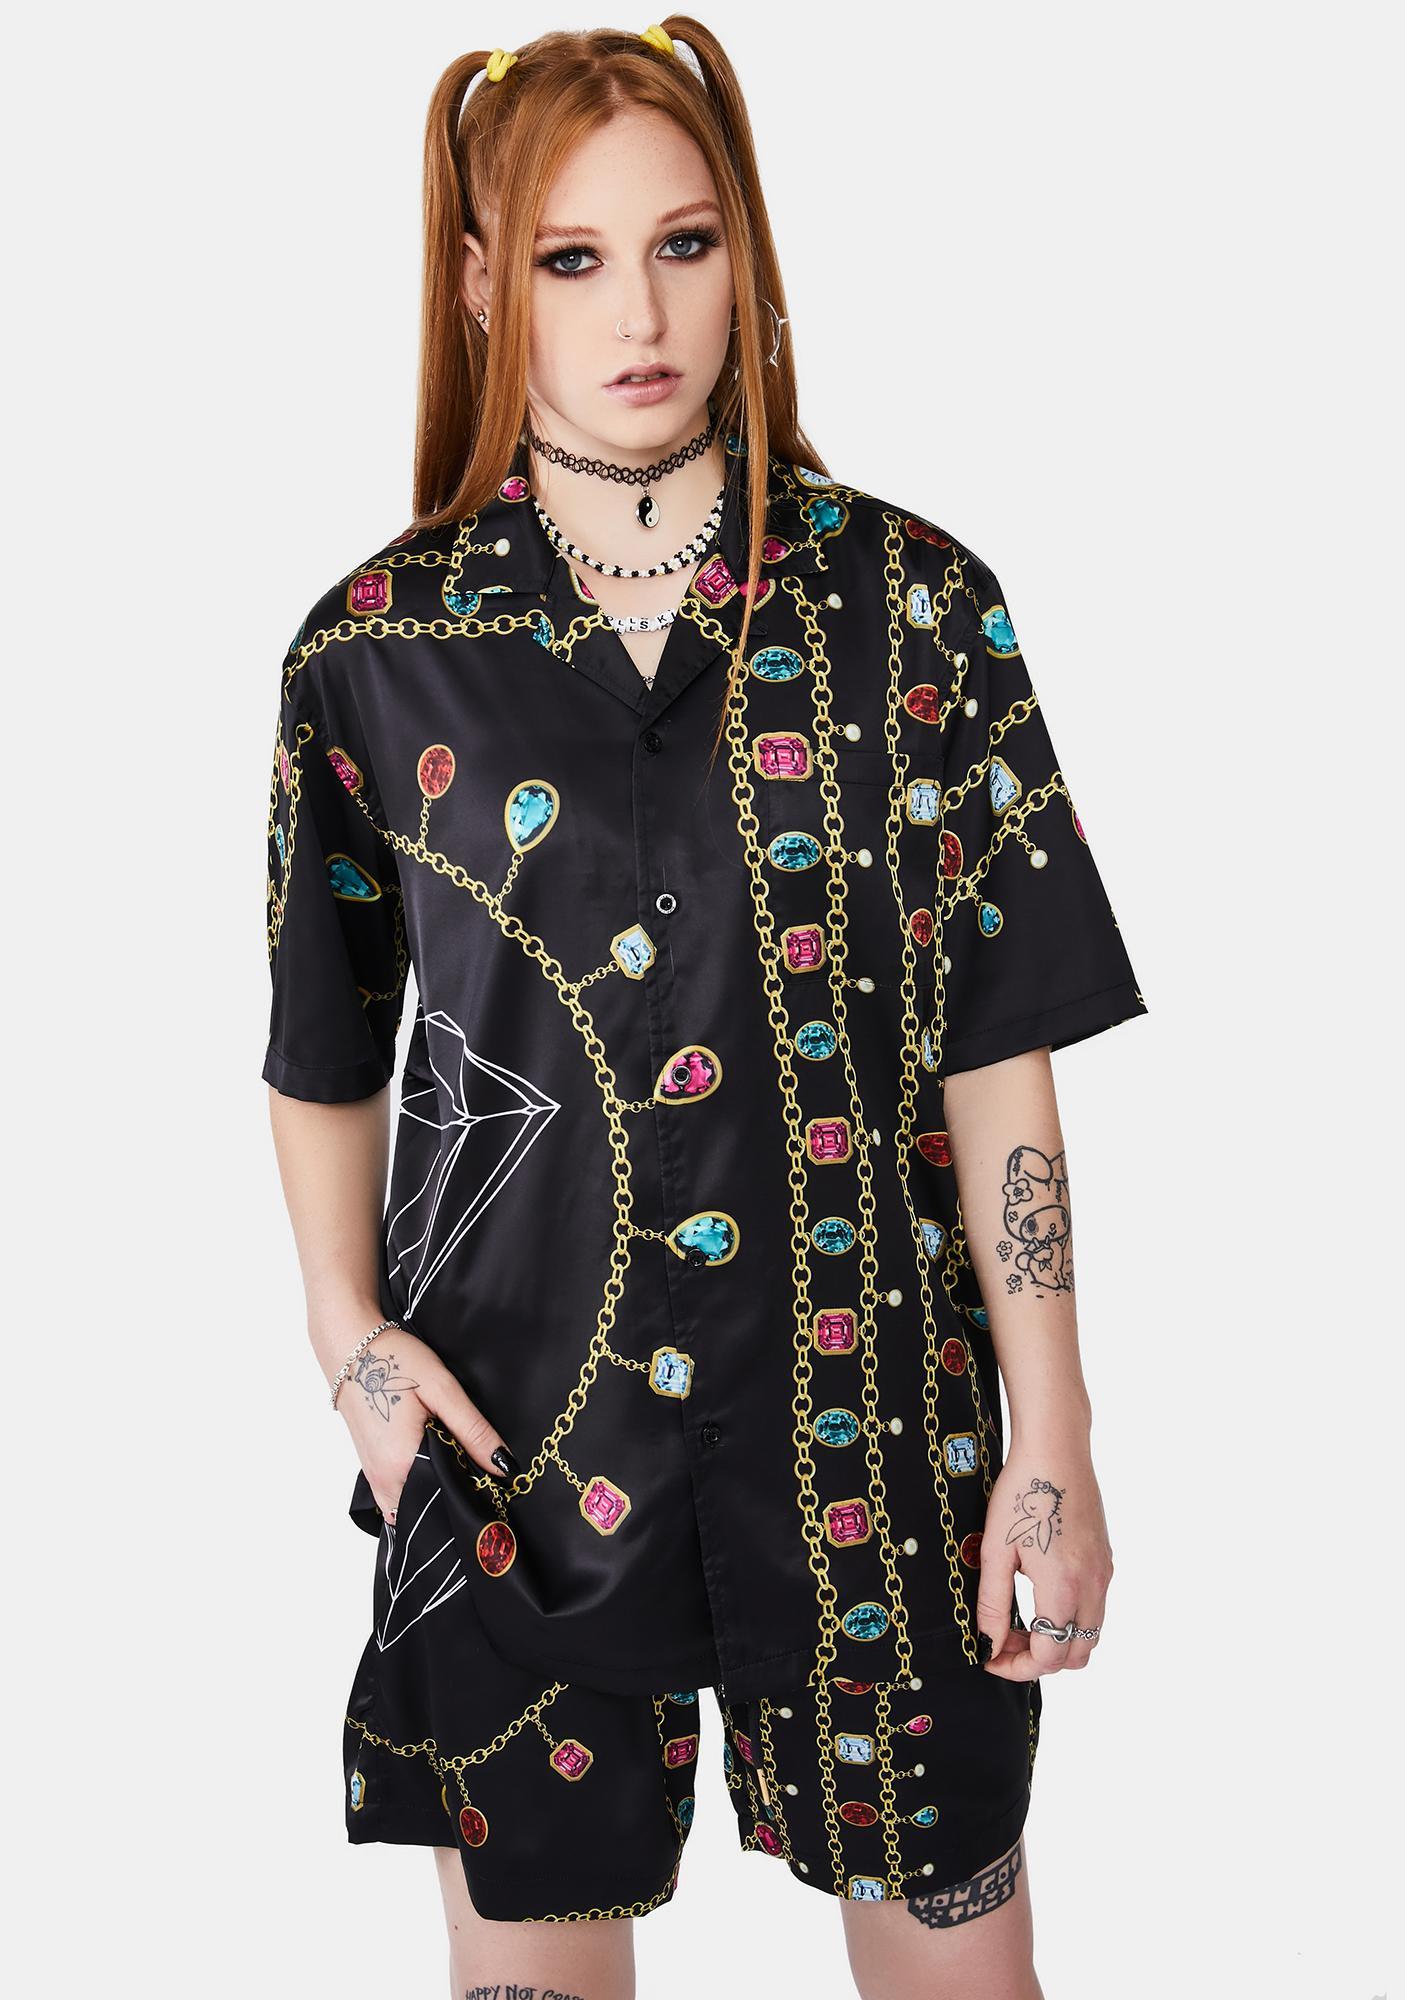 Diamond Supply Co Diamond Chain Button Up Shirt